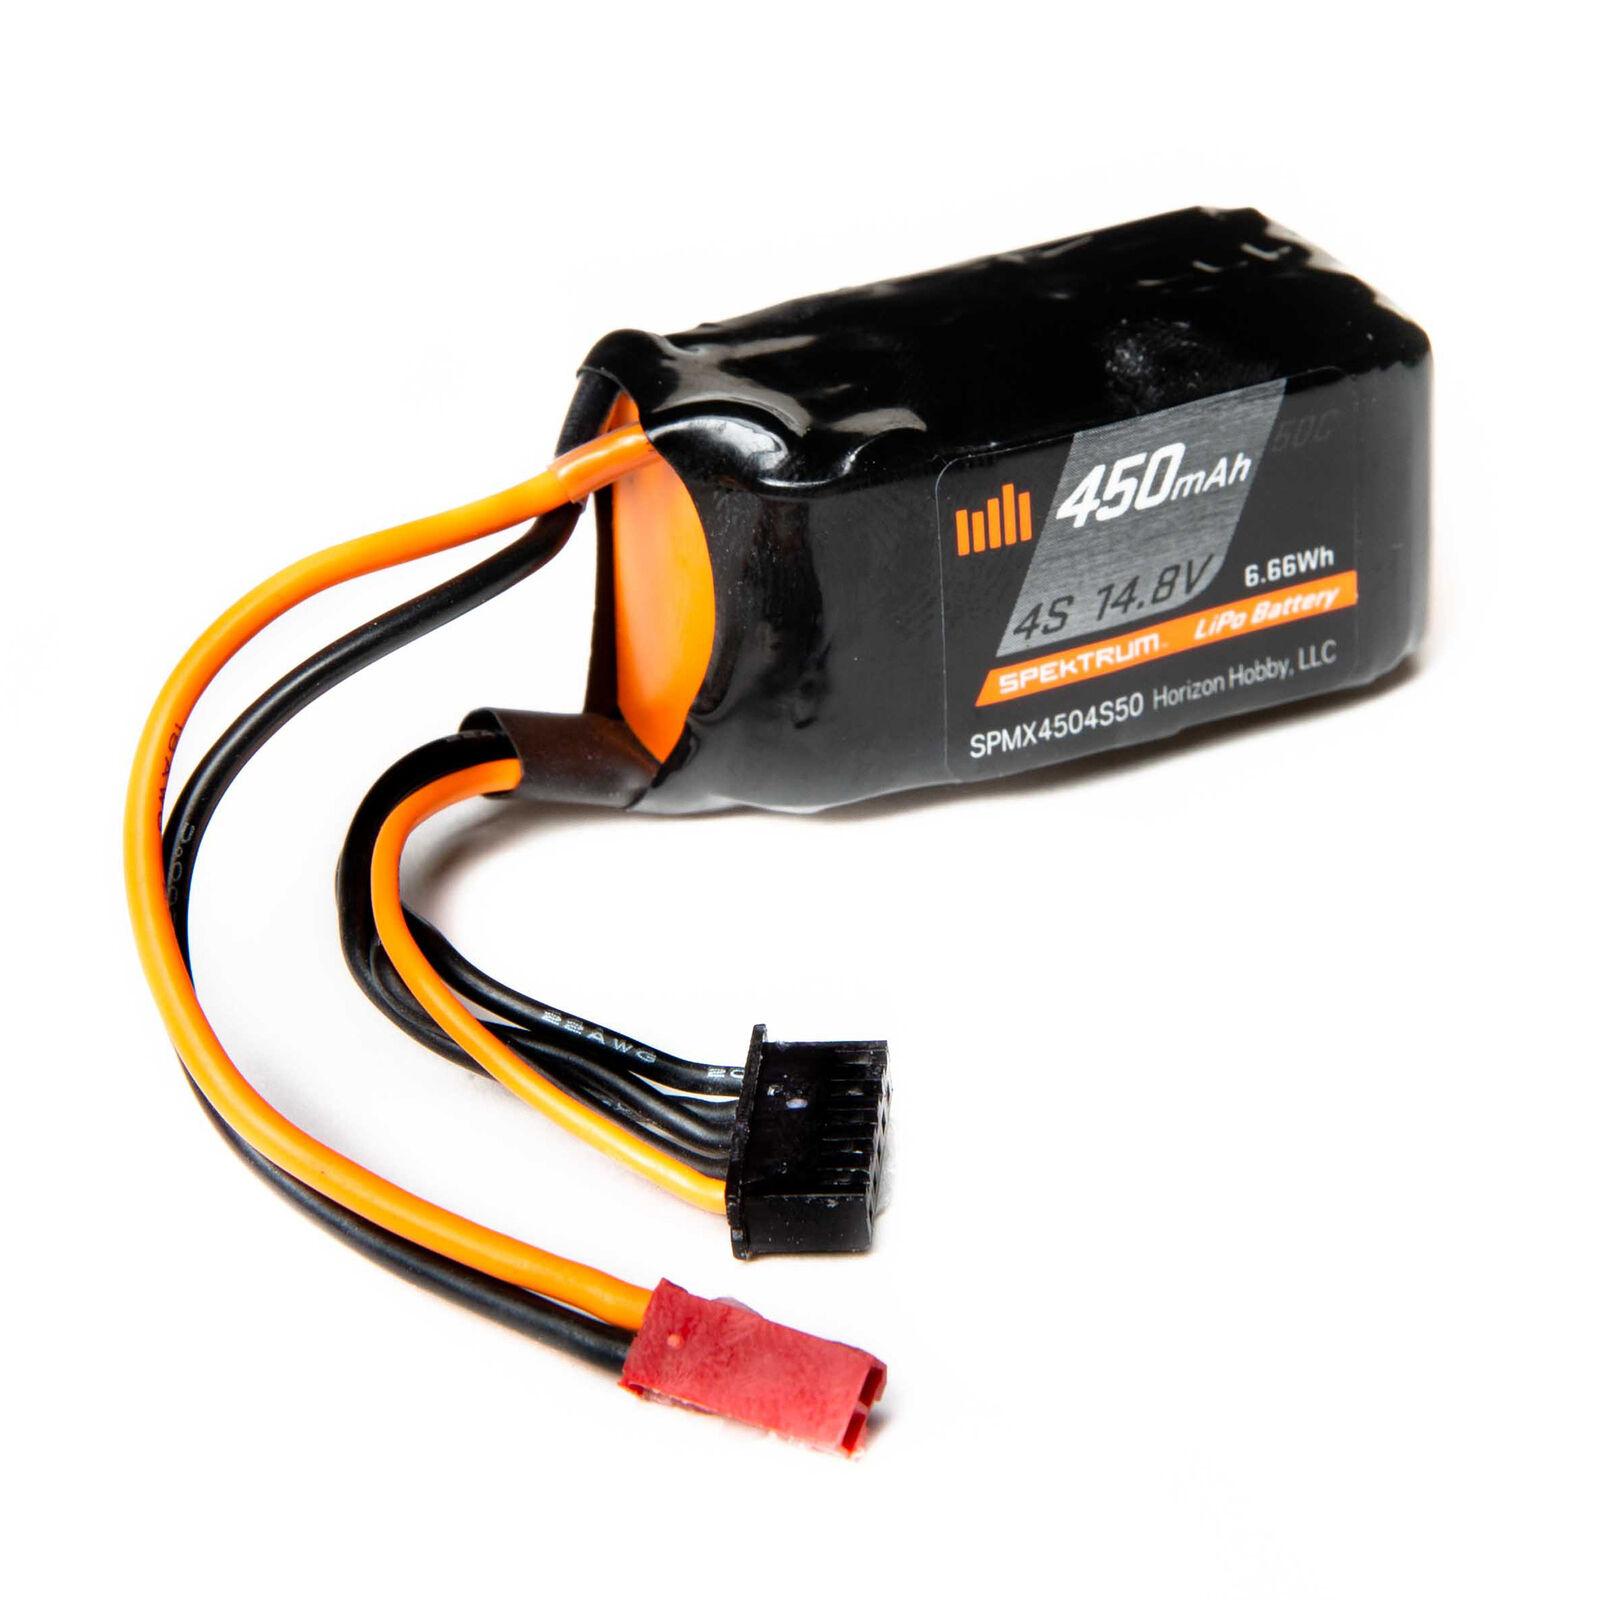 14.8V 450mAh 4S 50C LiPo Battery: JST